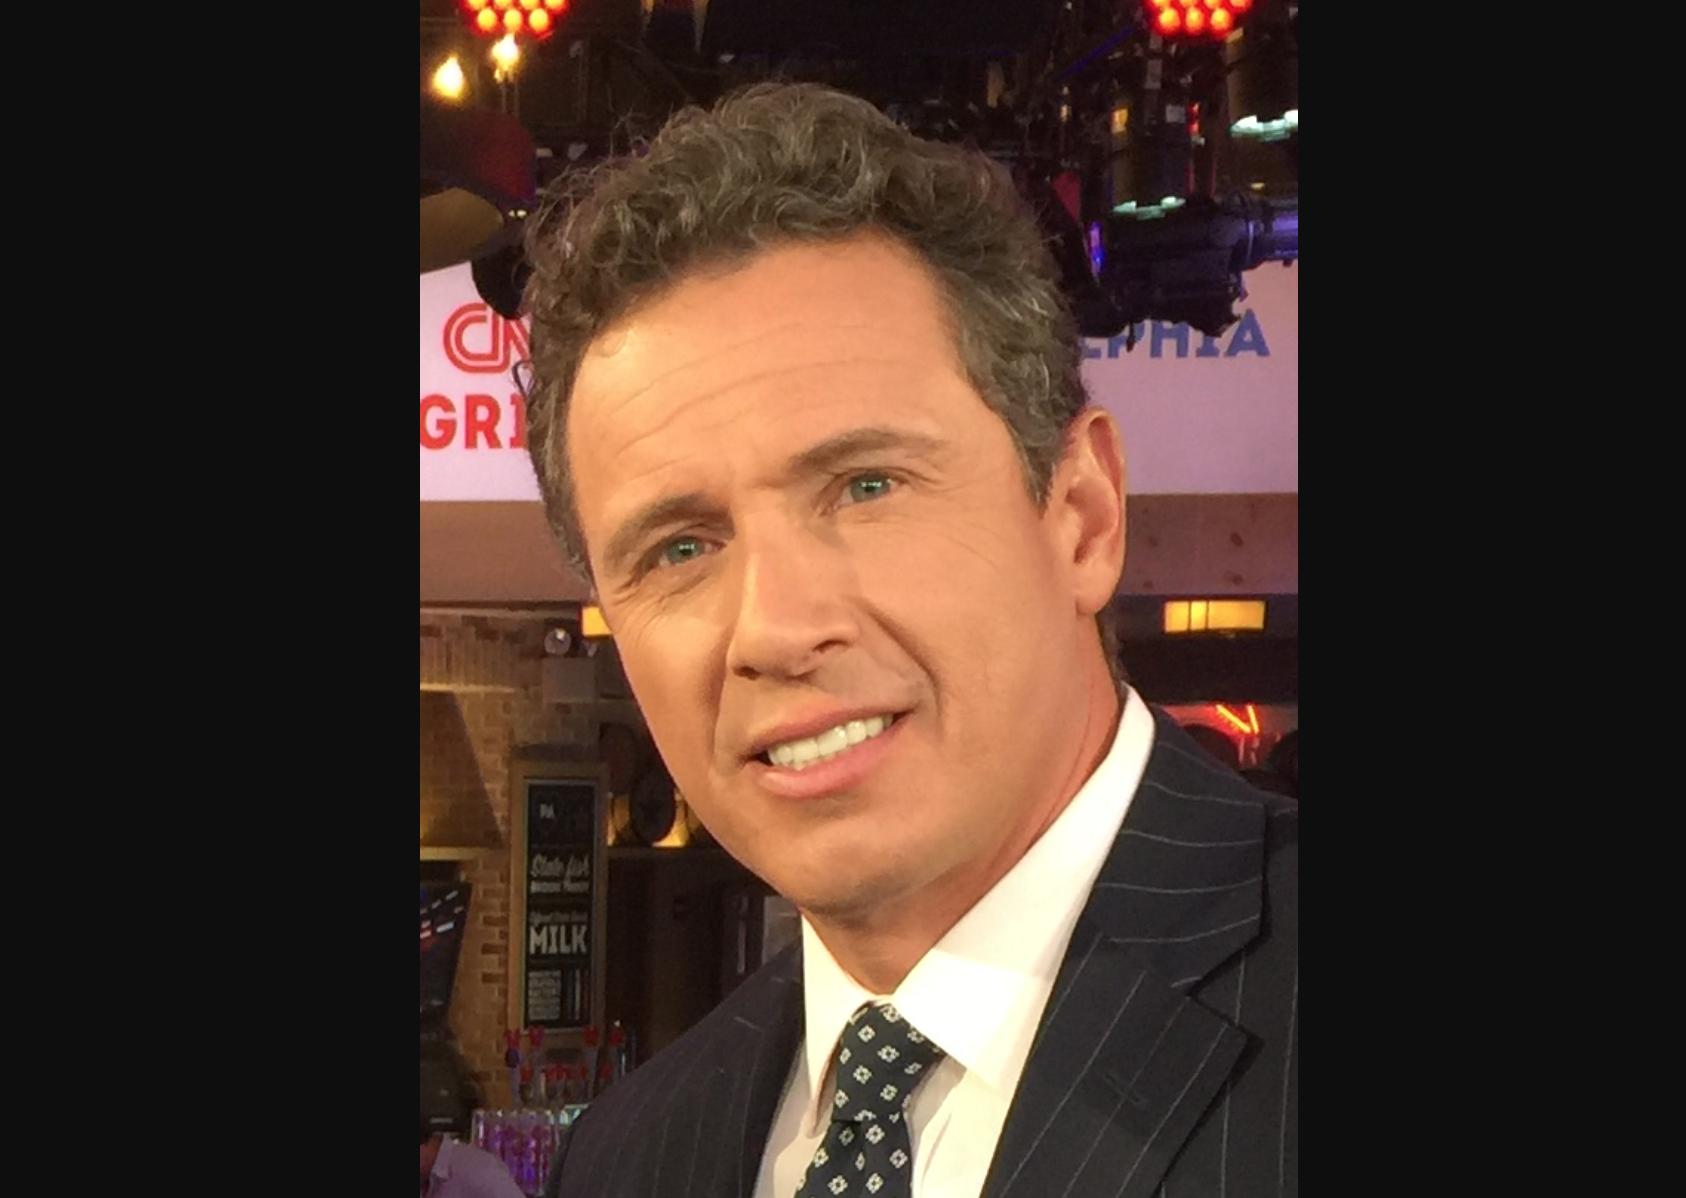 CNN Chris Cuomo Takes Hydroxychloroquine Analog for COVID-19